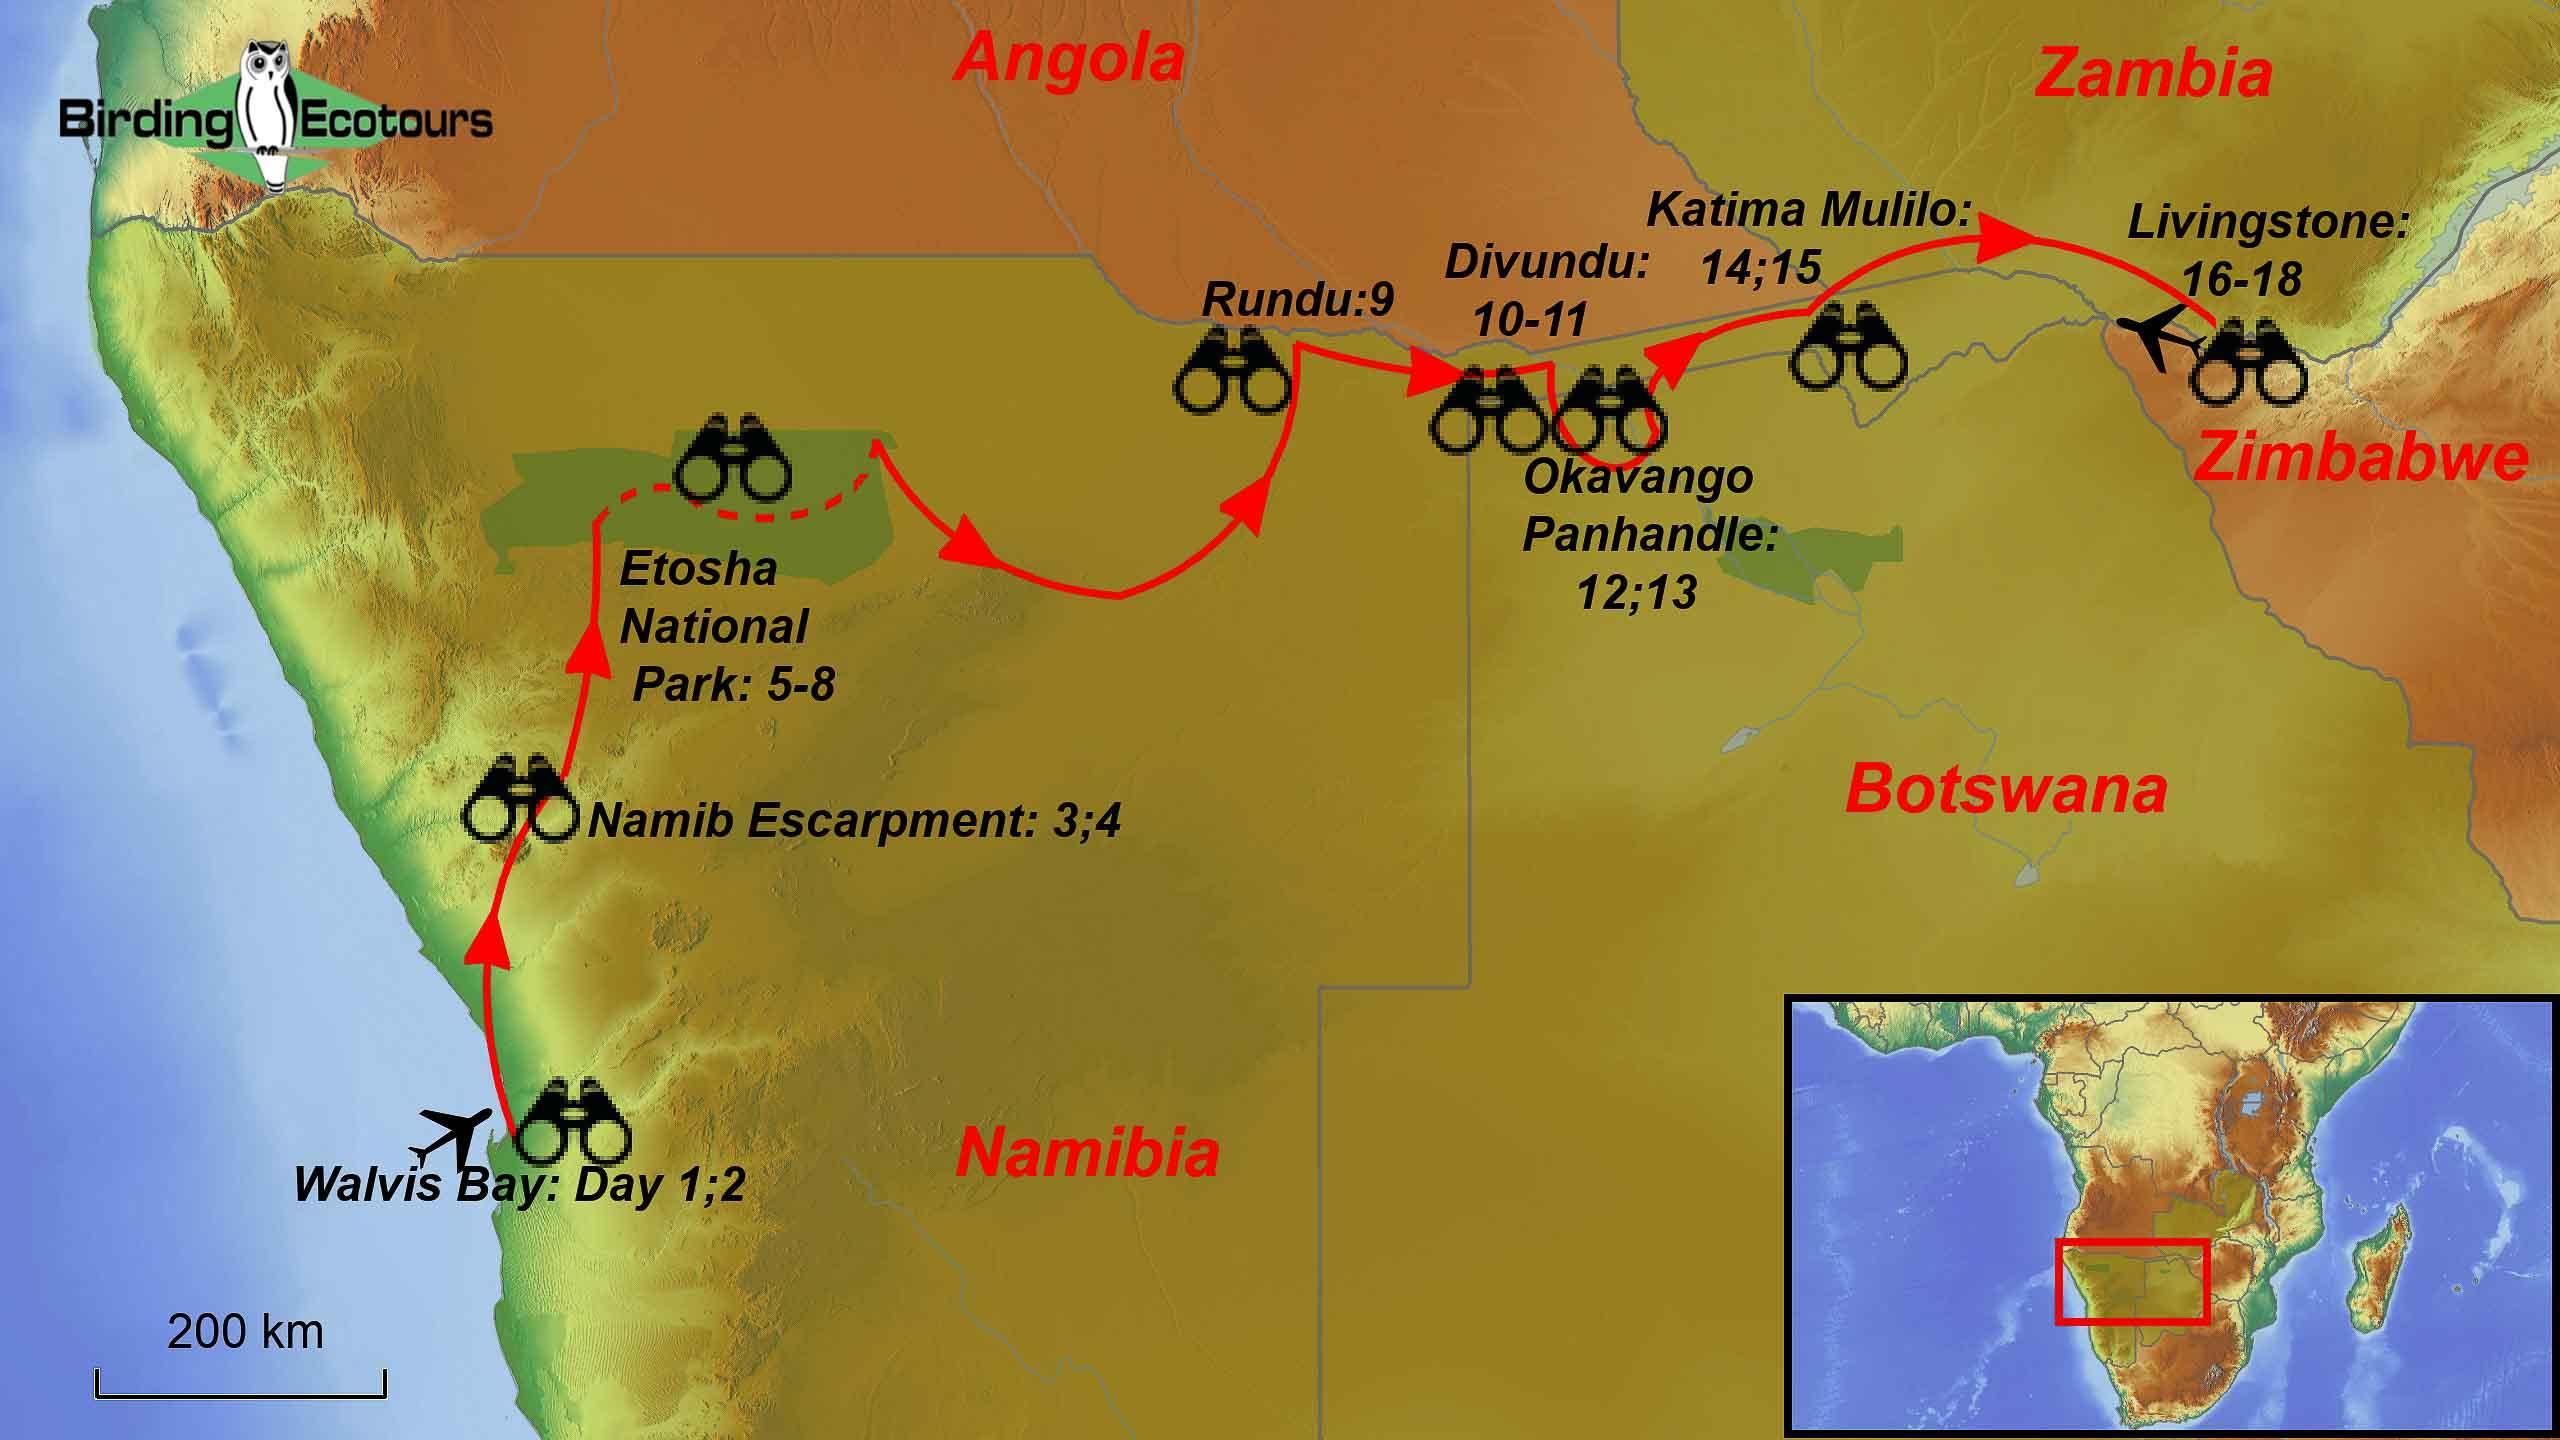 Namibia and Botswana birding tour